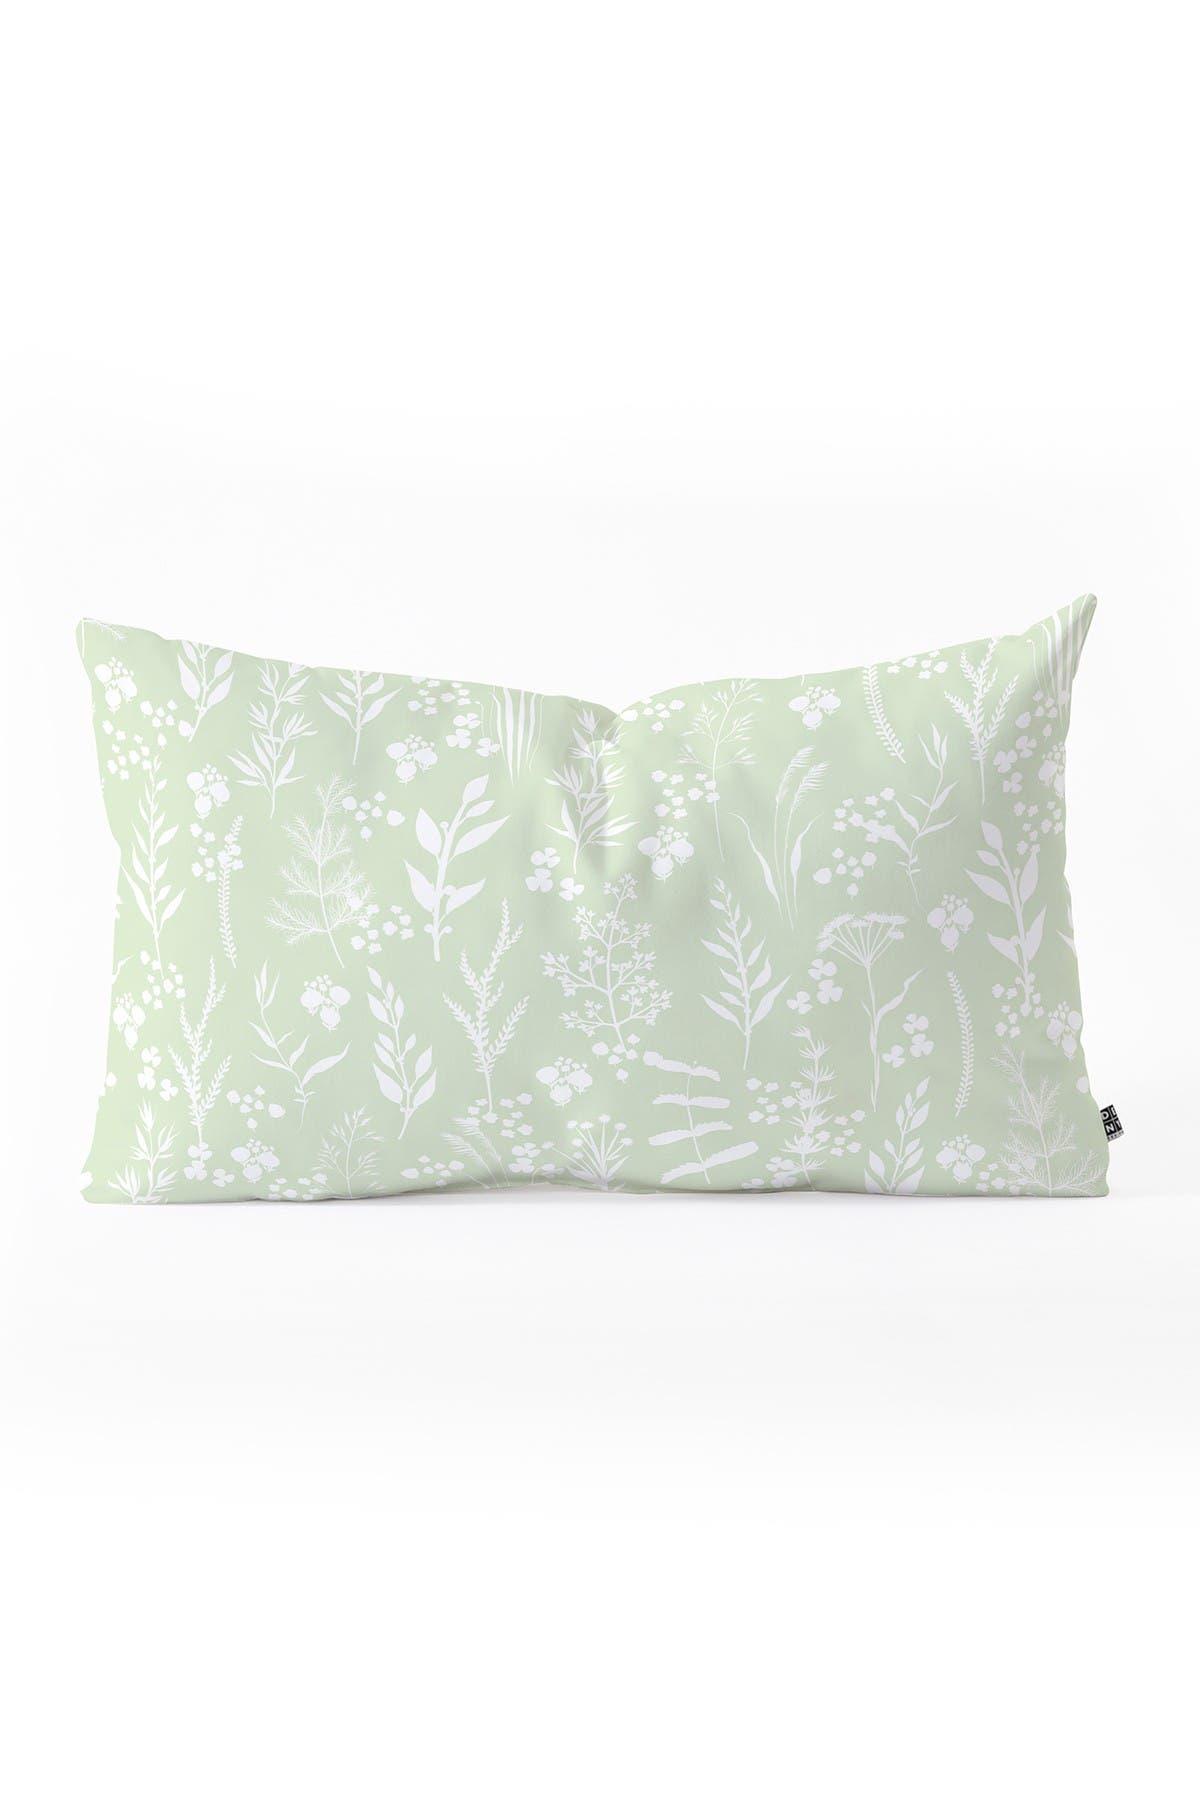 Deny Designs Iveta Abolina Margaux Ii Oblong Throw Pillow Nordstrom Rack